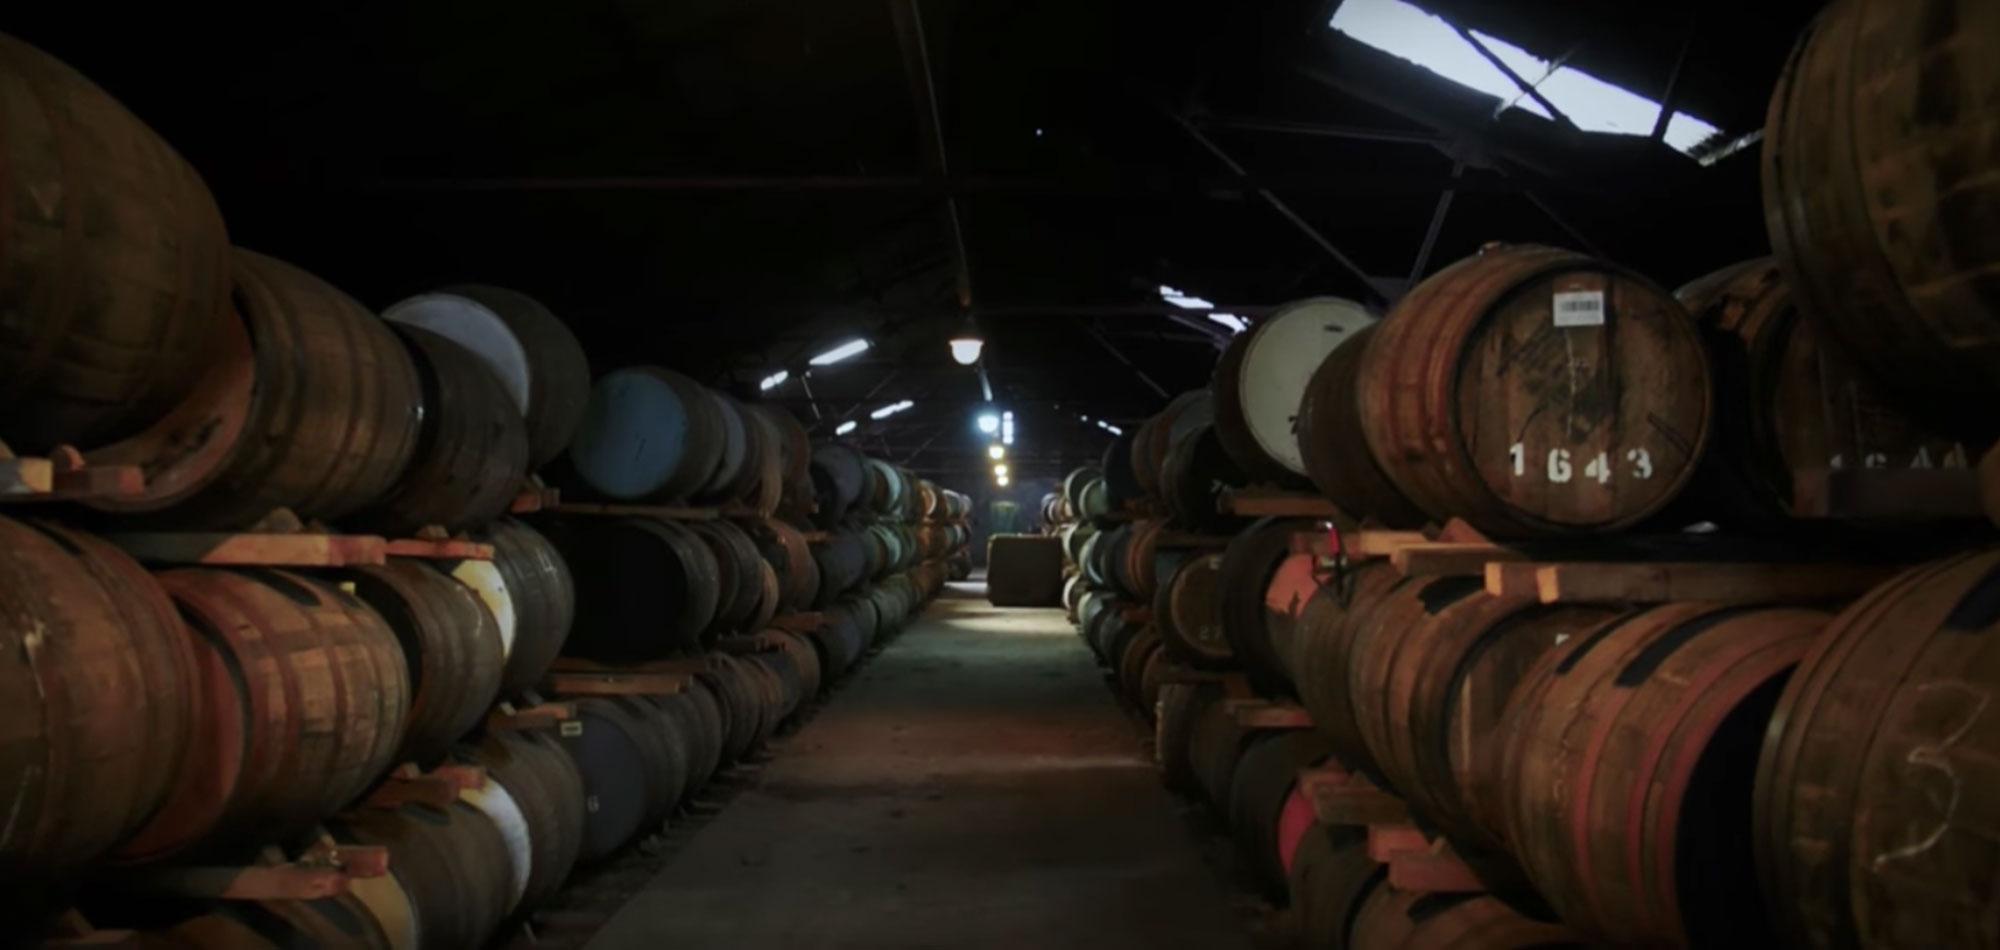 preparation-whisky-scotland-siredwards-page